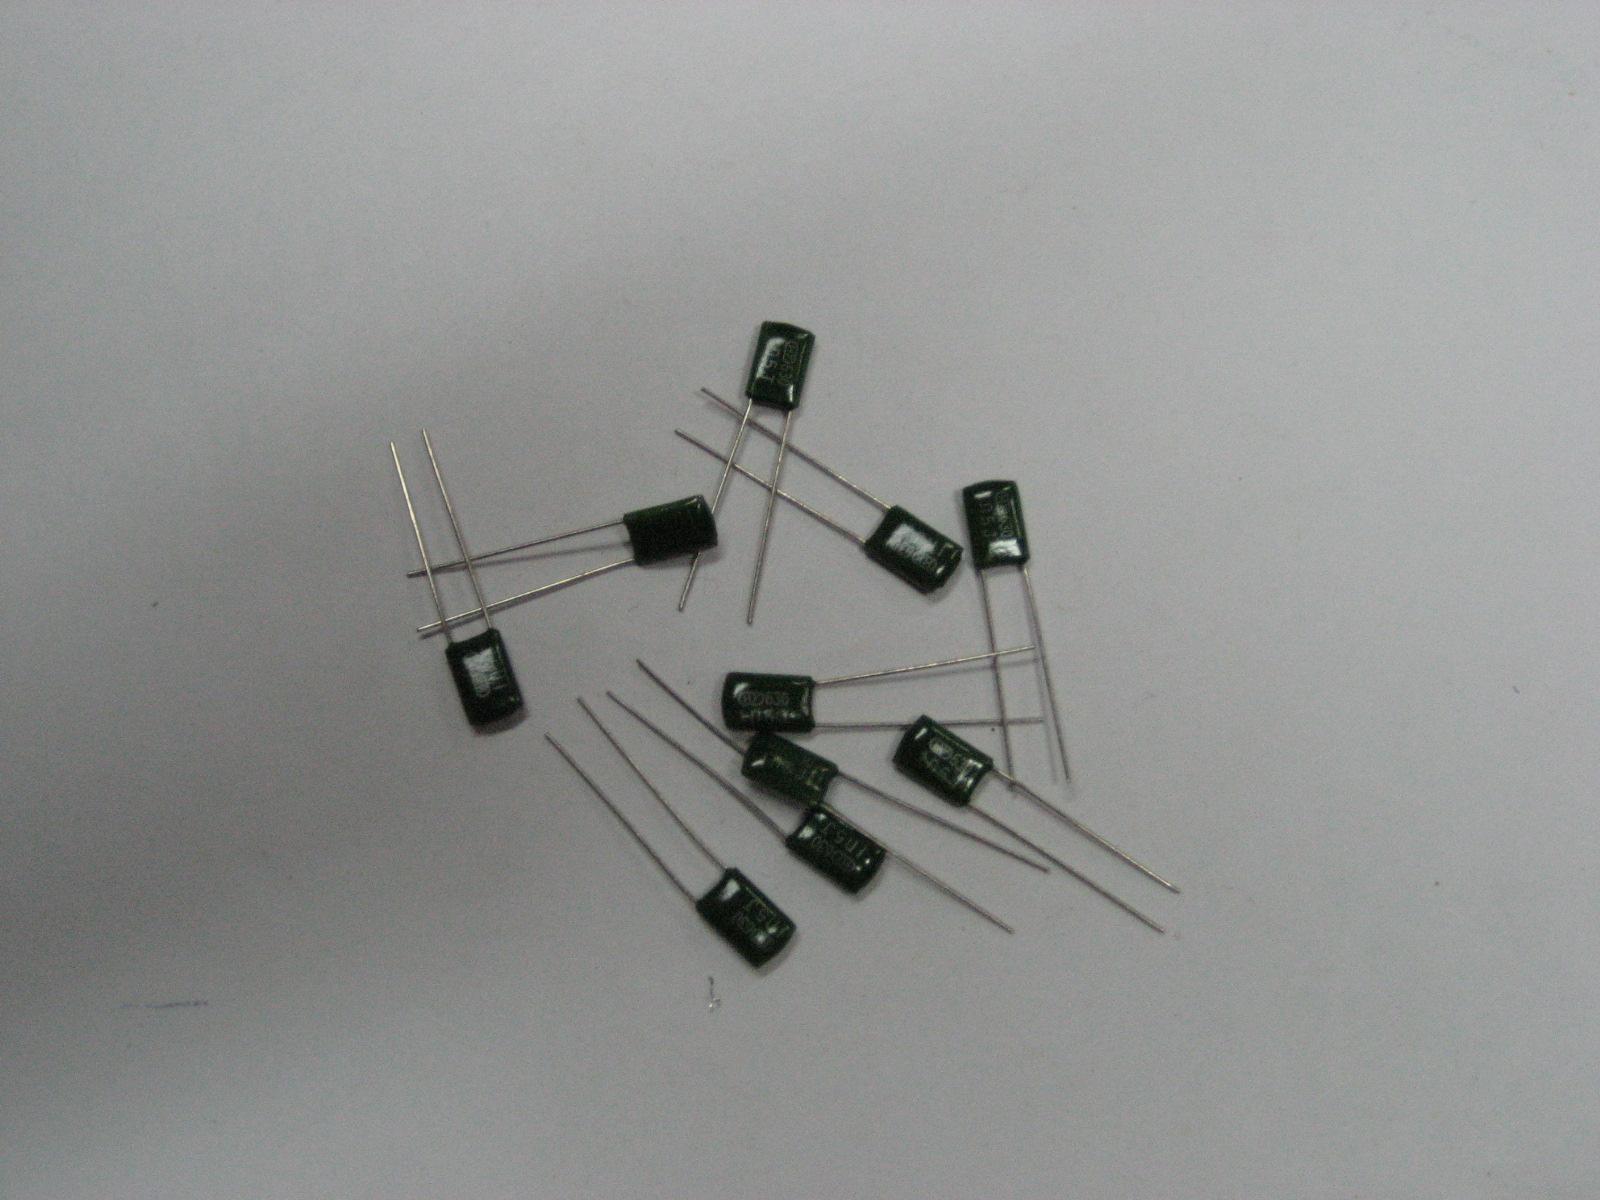 CL11聚酯膜电容器 CL11400V104 HY